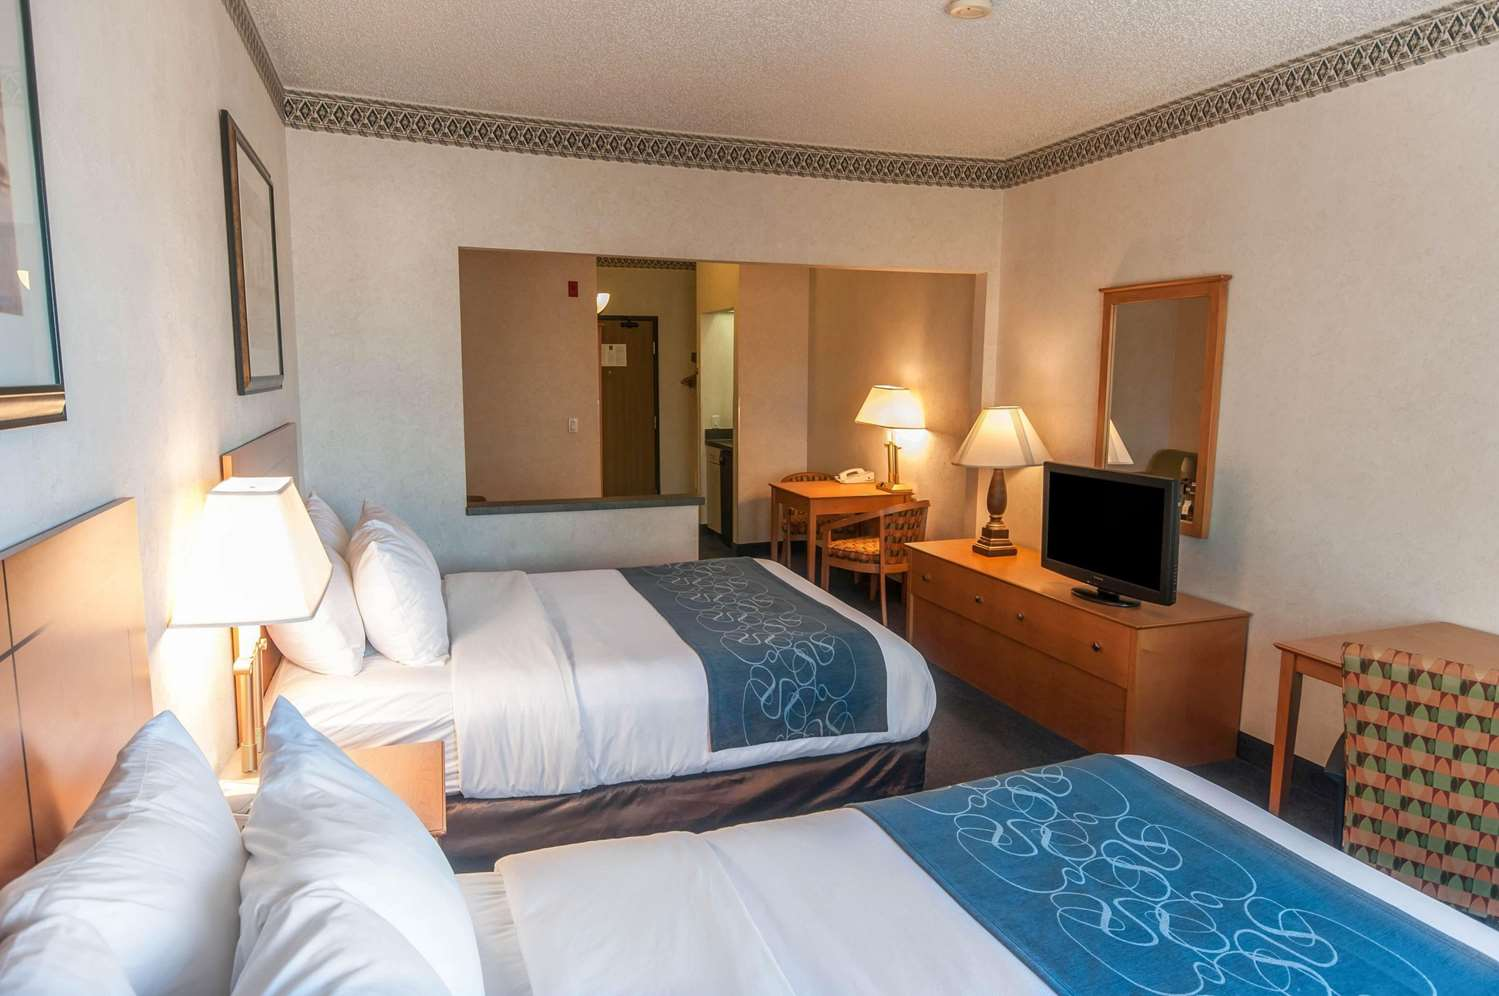 Comfort Suites University Las Cruces, NM - See Discounts